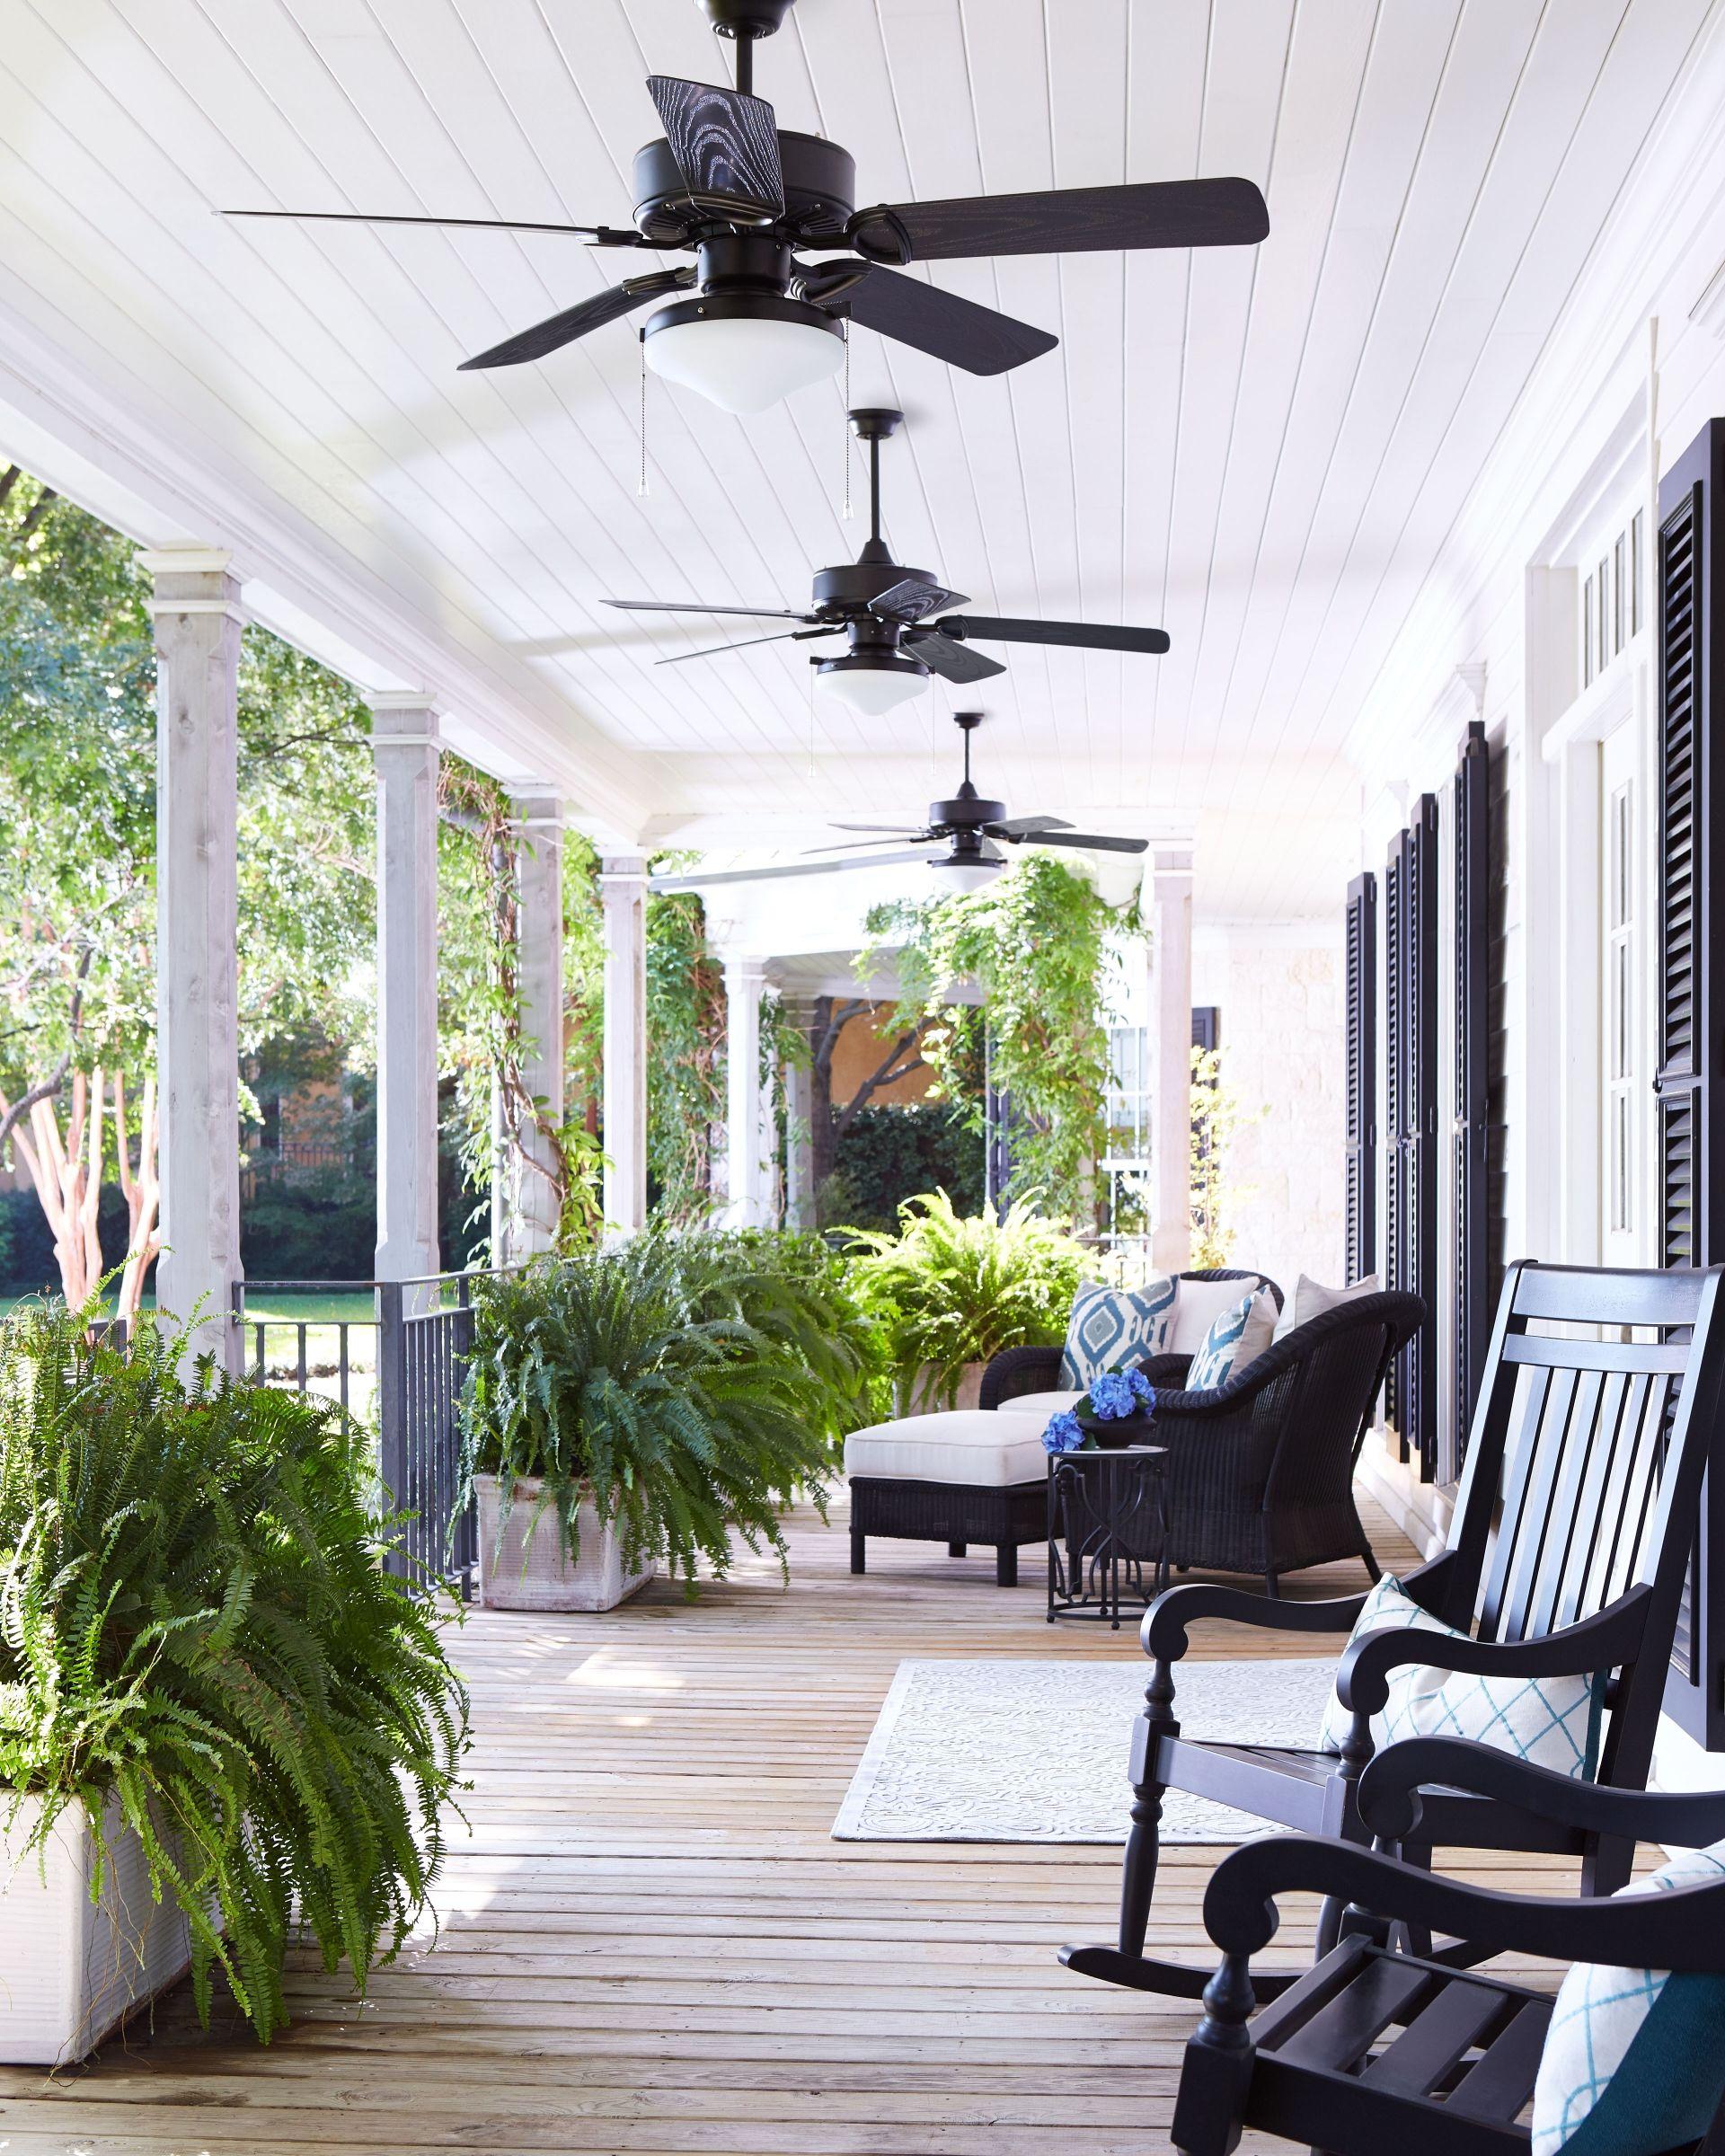 house terraces deck by ceilings ceiling fans blankets porch for fandiego pin pinterest patios garten terrace patio outdoor on